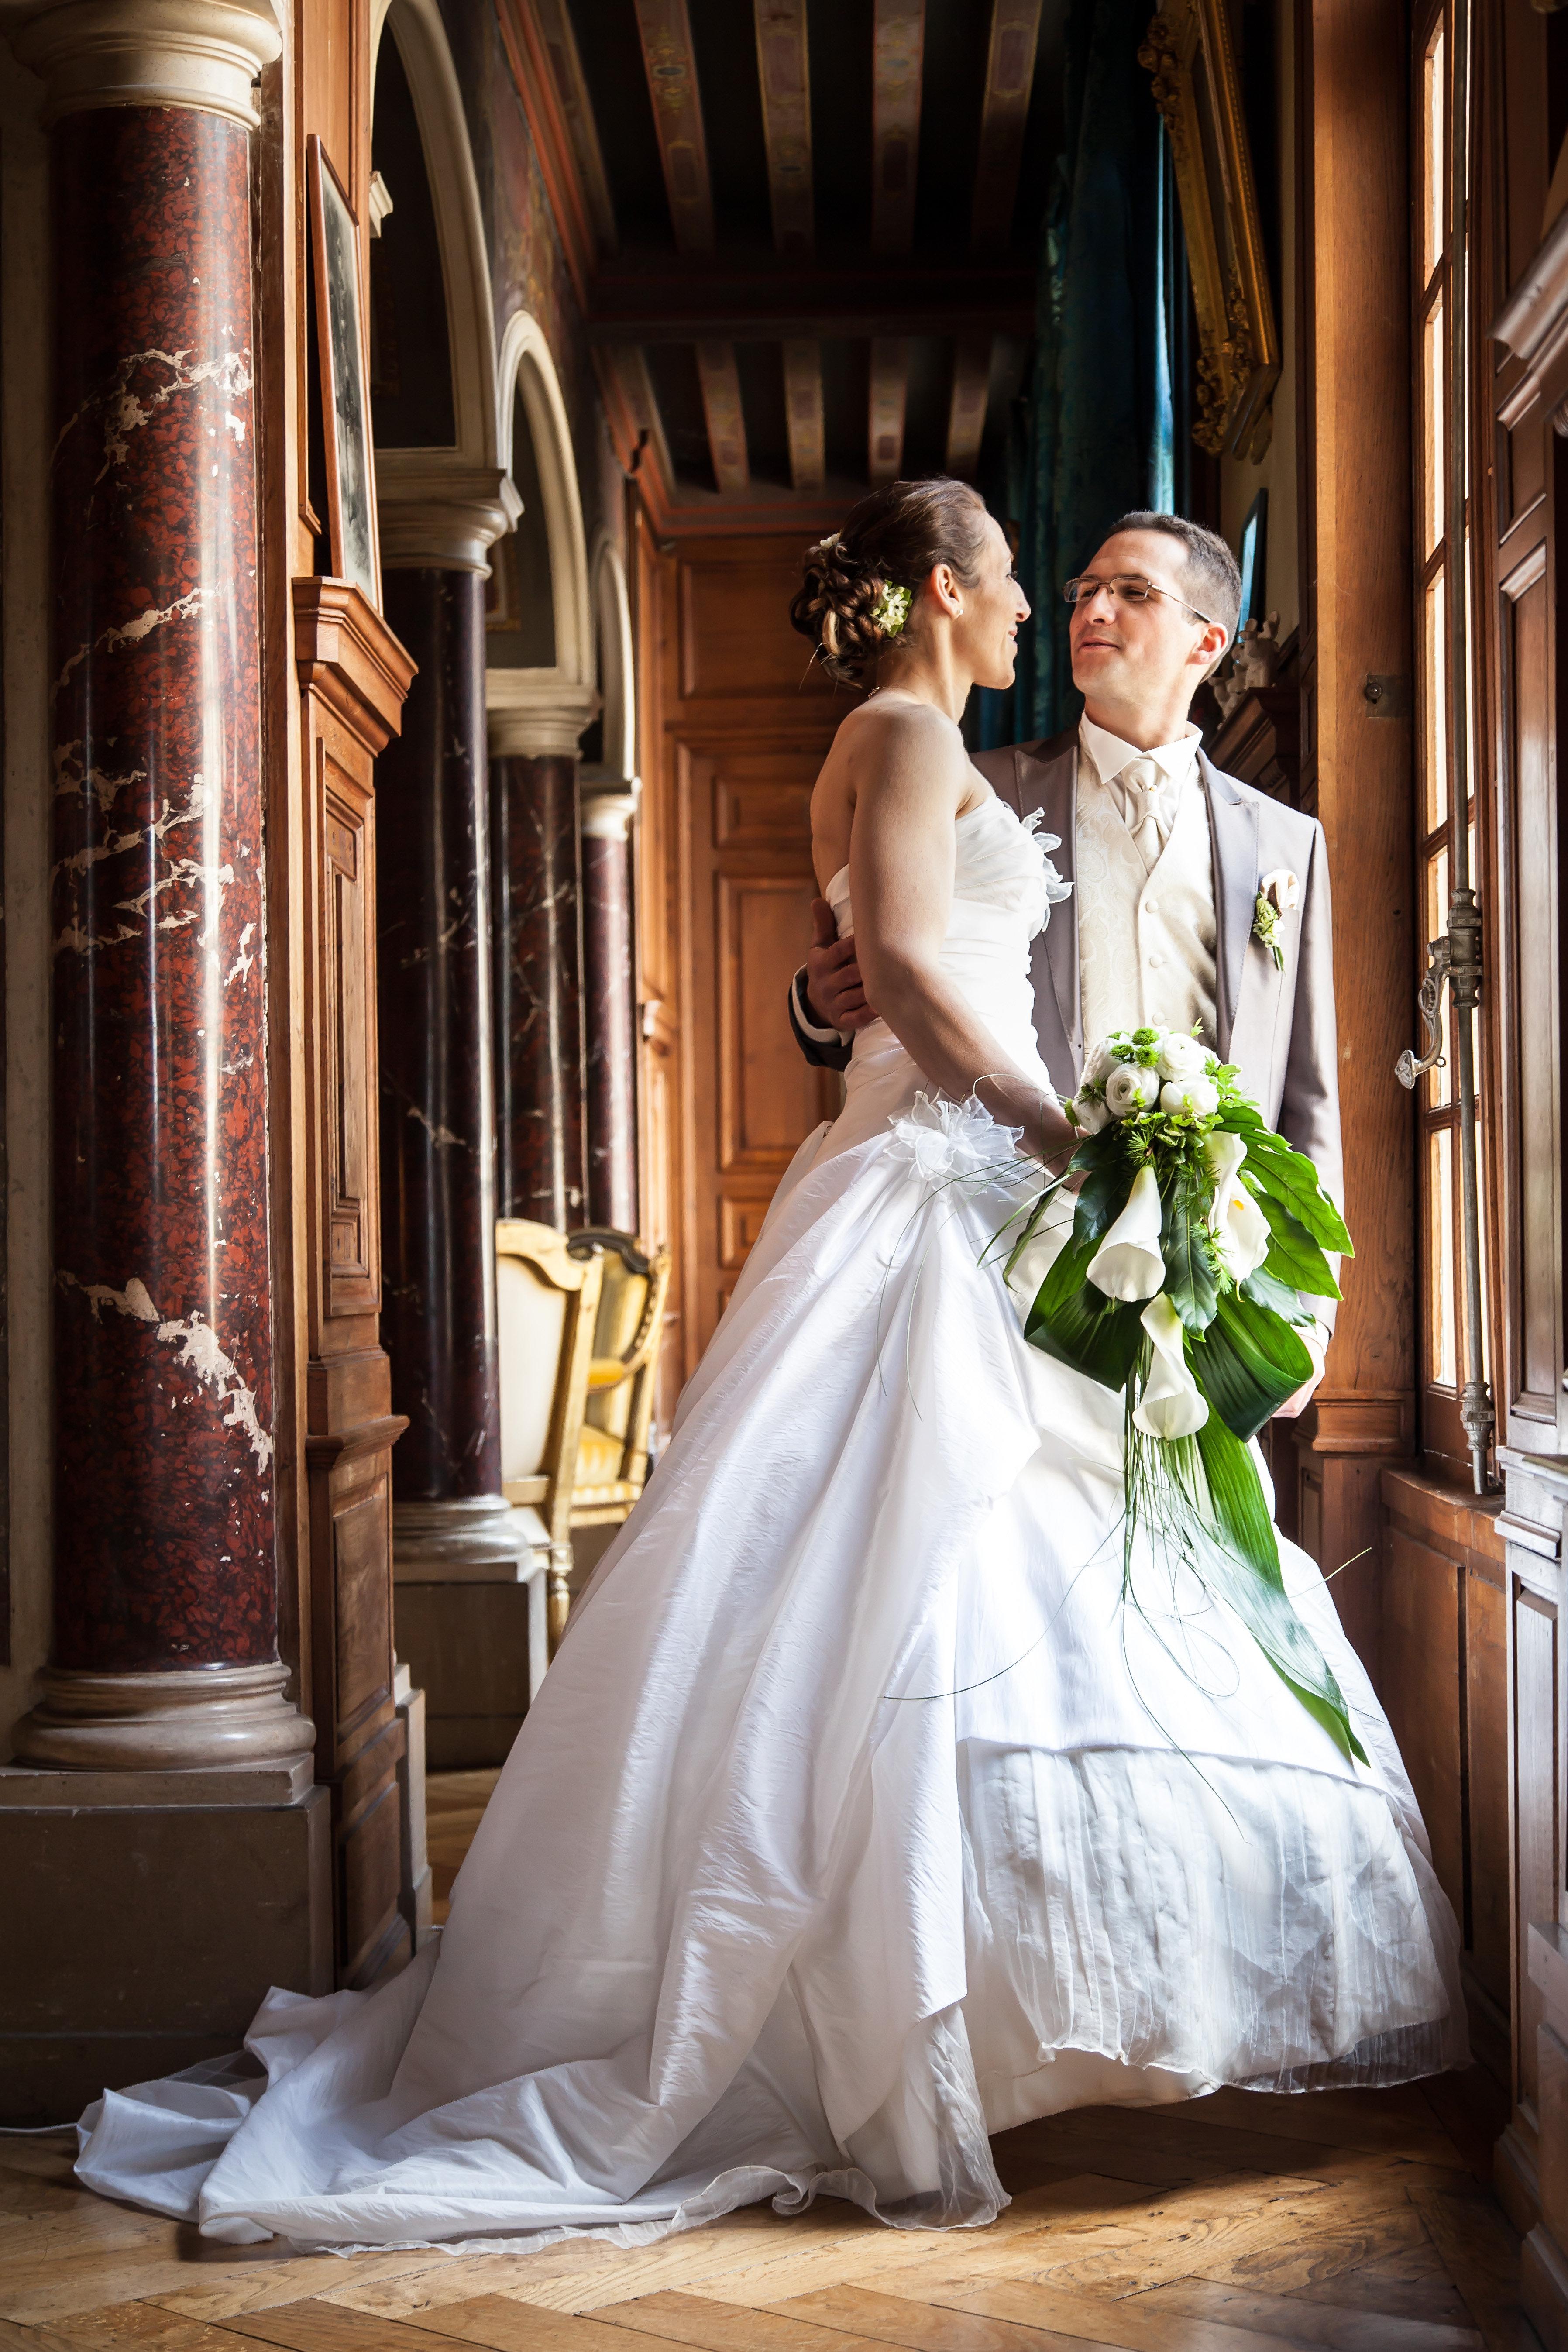 bisceglia pascal photographe autun bourgogne sully mariage chteau - Chateau De Sully Mariage